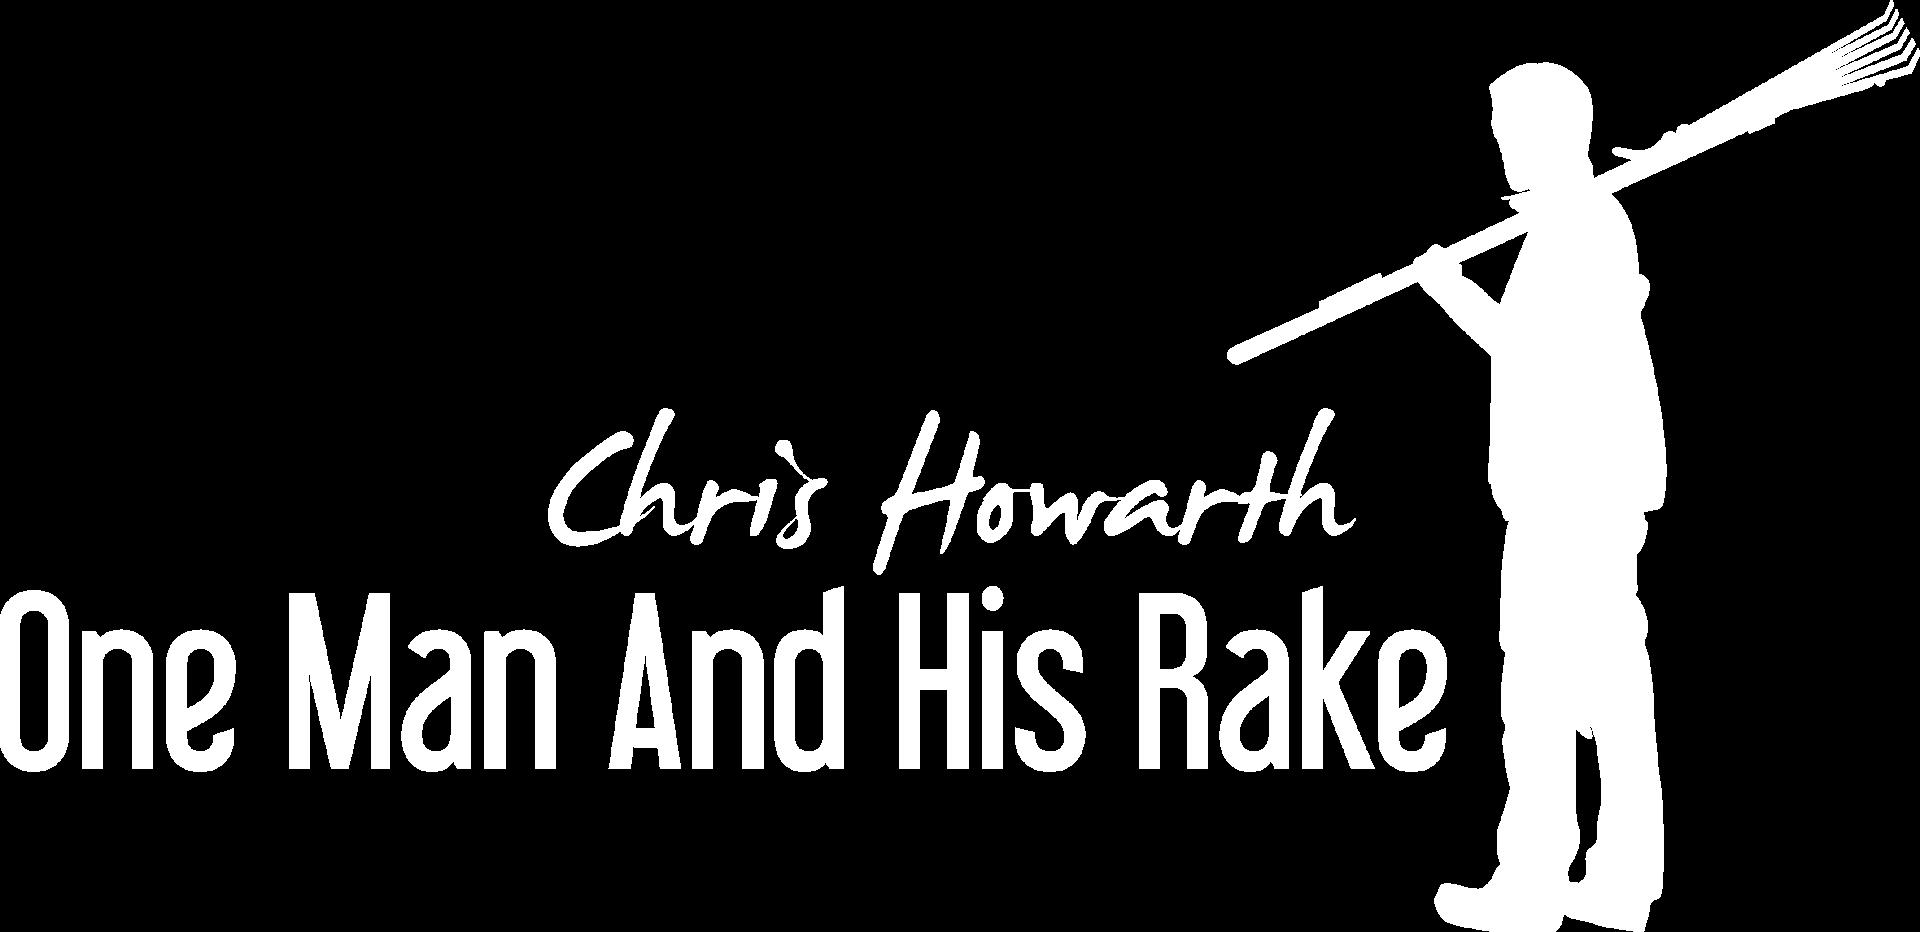 One Man and His Rake